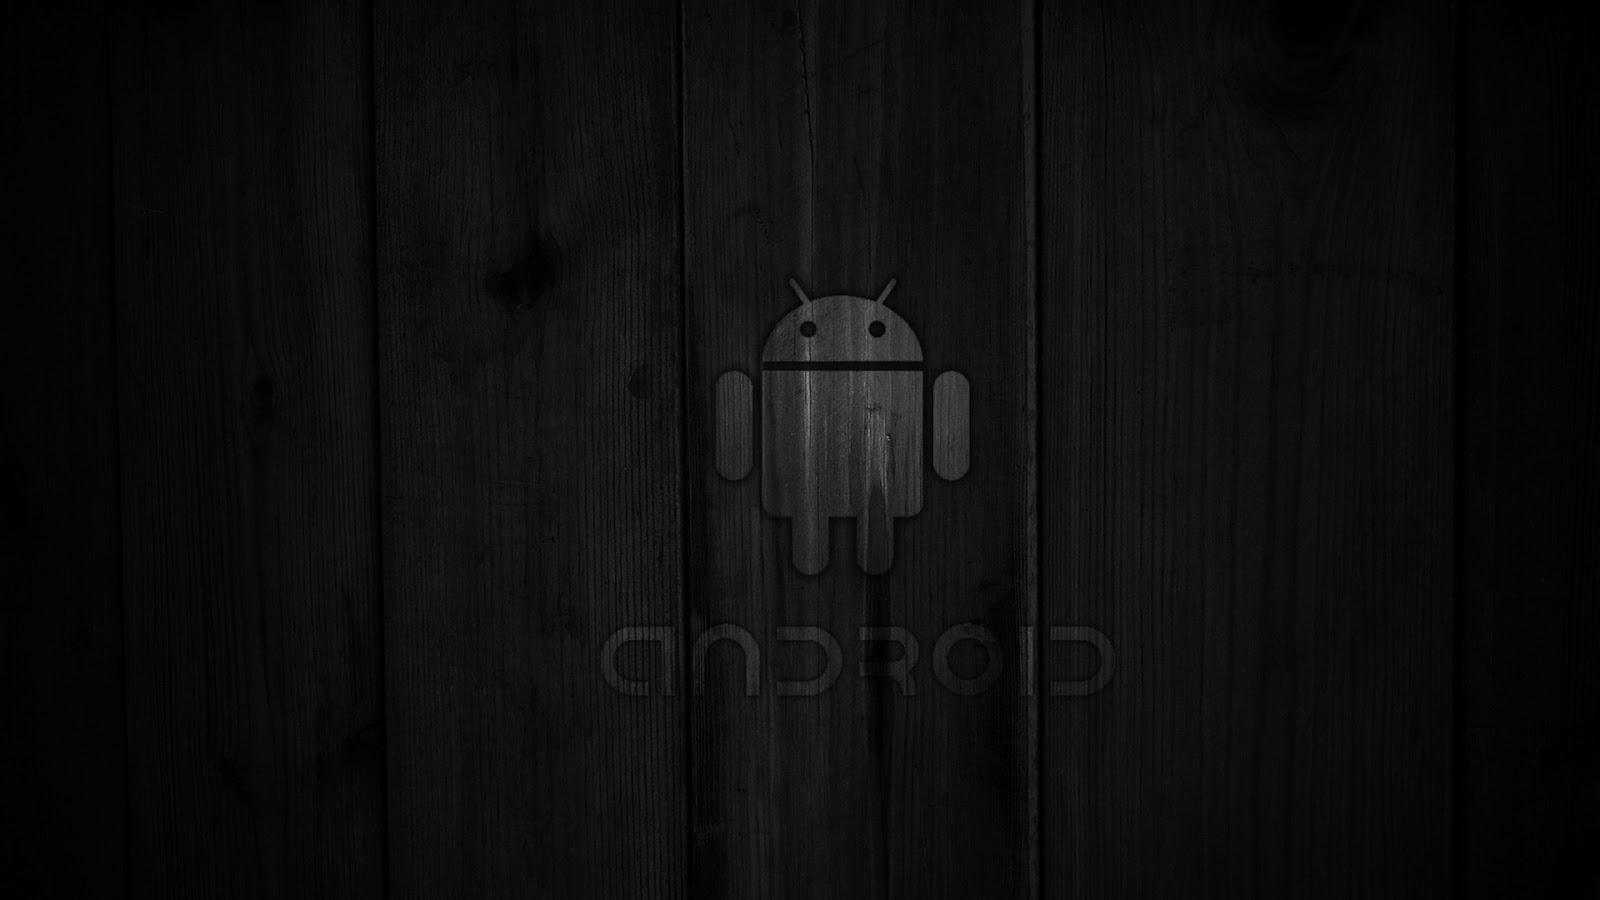 http://2.bp.blogspot.com/-MekfPdgkZFY/UQwS69VxpDI/AAAAAAAAAYM/DH8j23Jn0oU/s1600/android-black-wood-super-hq-581777.jpg